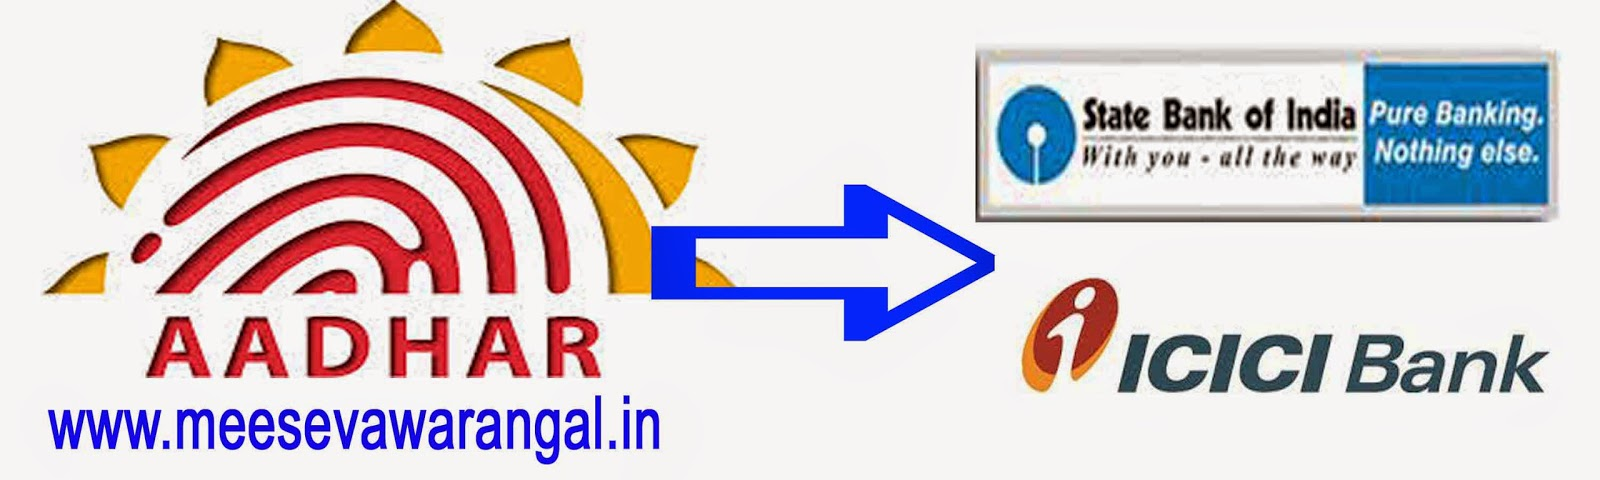 Aadhar Card to SBI Bank & ICICI Bank Account Link Online / Offline